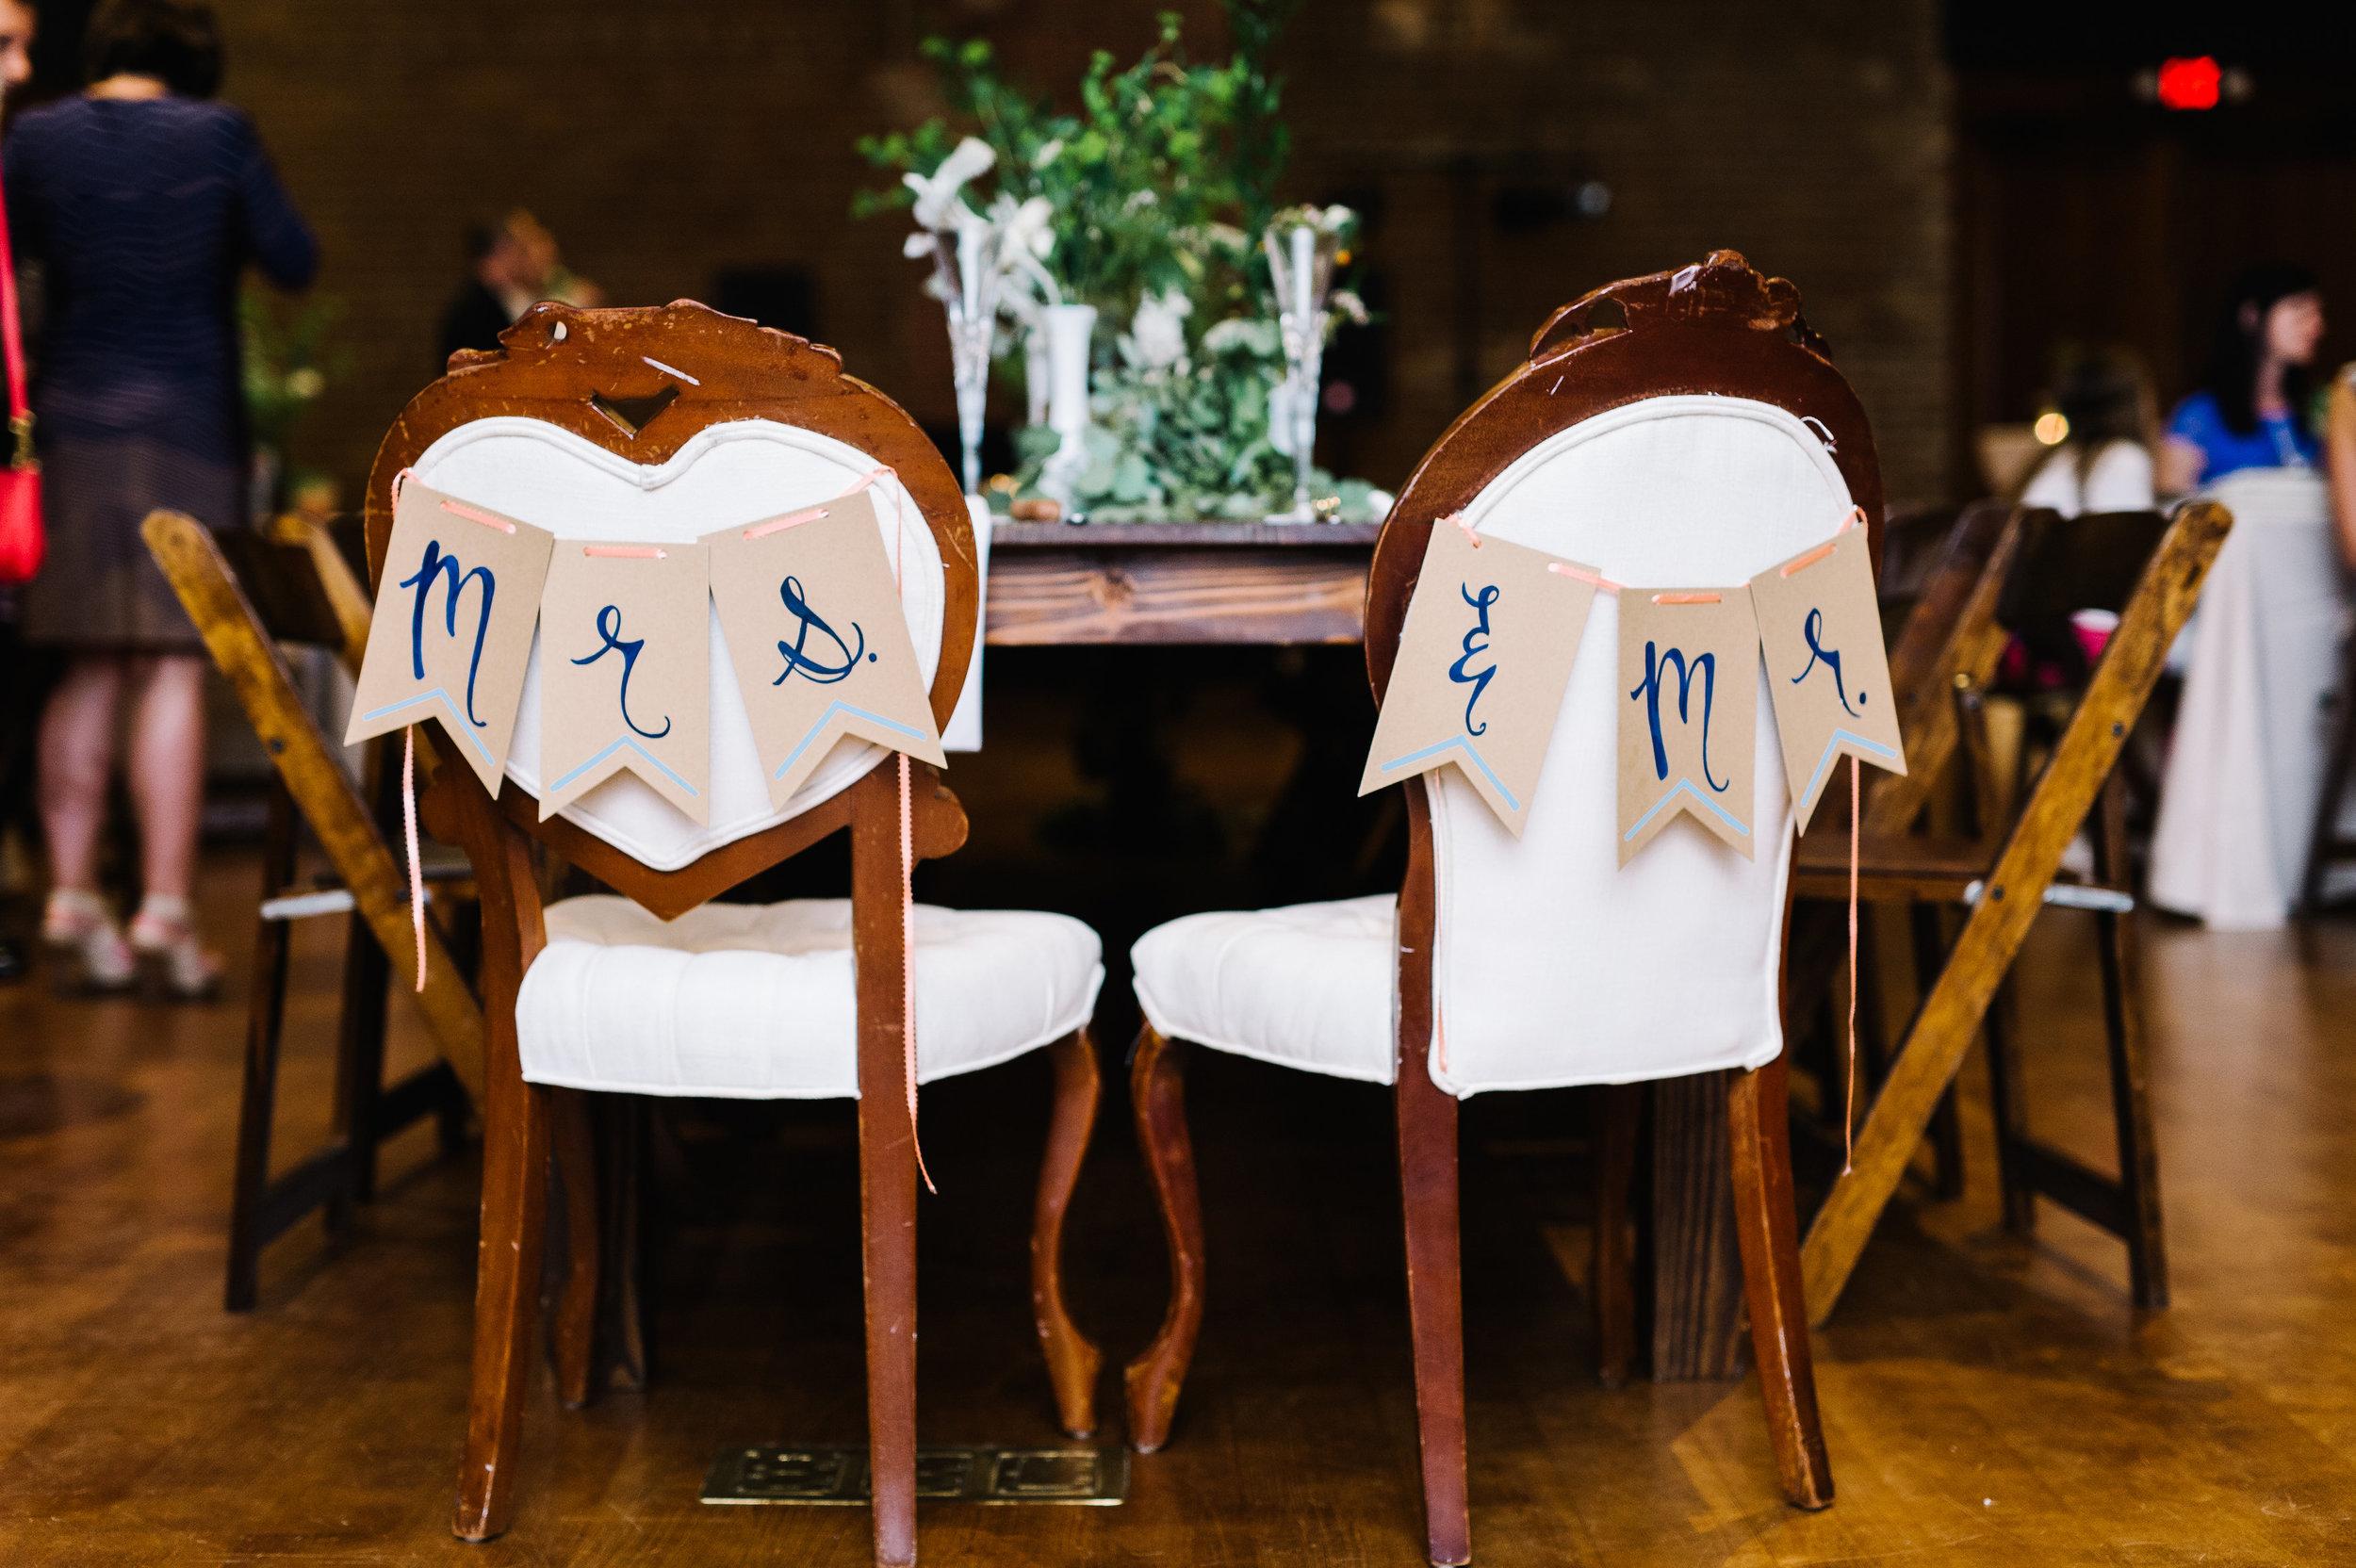 amber-and-paul-rach-loves-troy-charles-h-morris-center-wedding-sarah-seven-helene-lace-wedding-dress-ivory-and-beau-bridal-boutique-savannah-wedding-planner-savannah-event-designer-savannah-florist-savannah-weddings-savannah-bridal-boutique-340.jpg